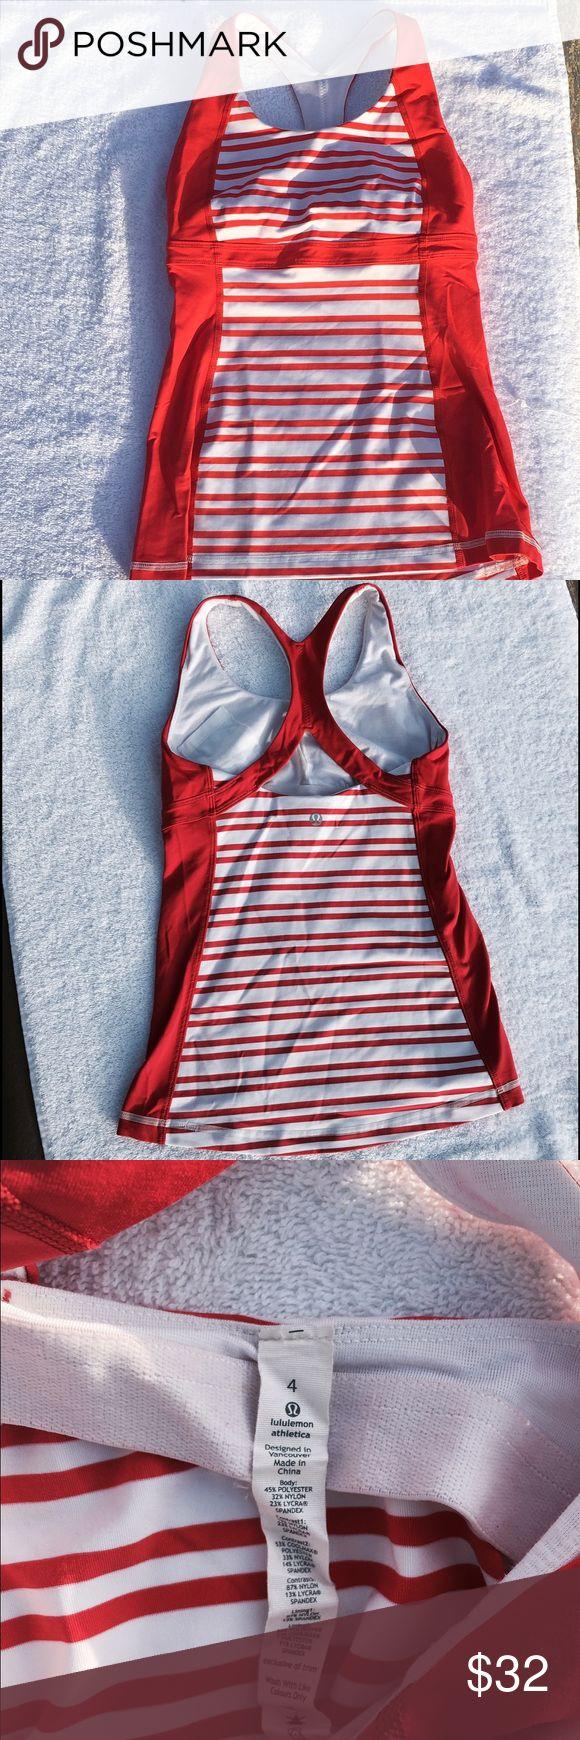 Sanctuary palm tree shorts   Fashion, Clothes design